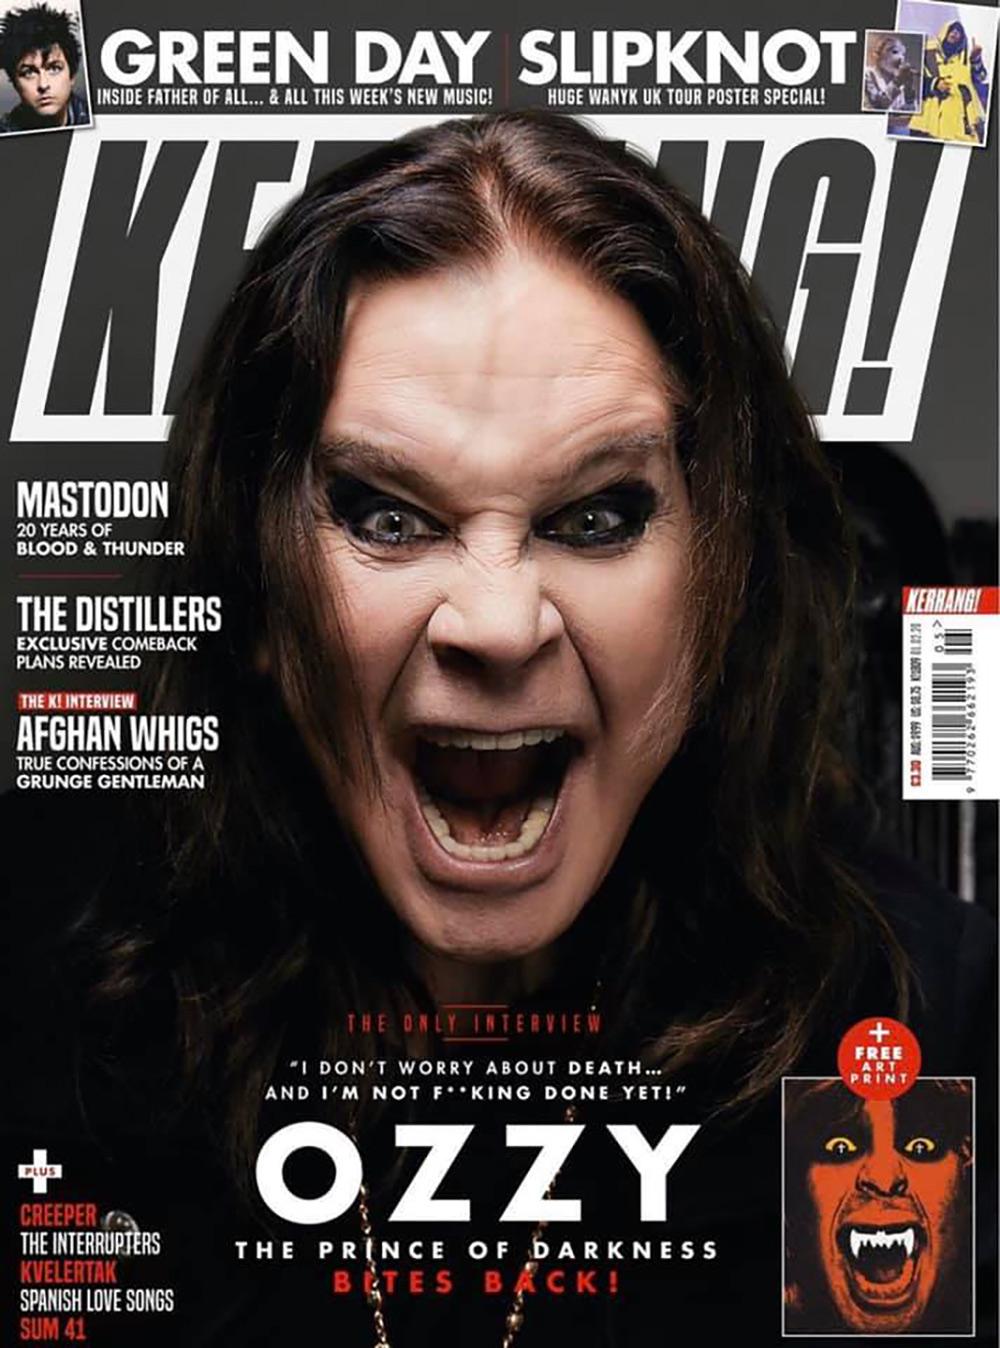 Ozzy Osbourne Kerrang! cover story 2019